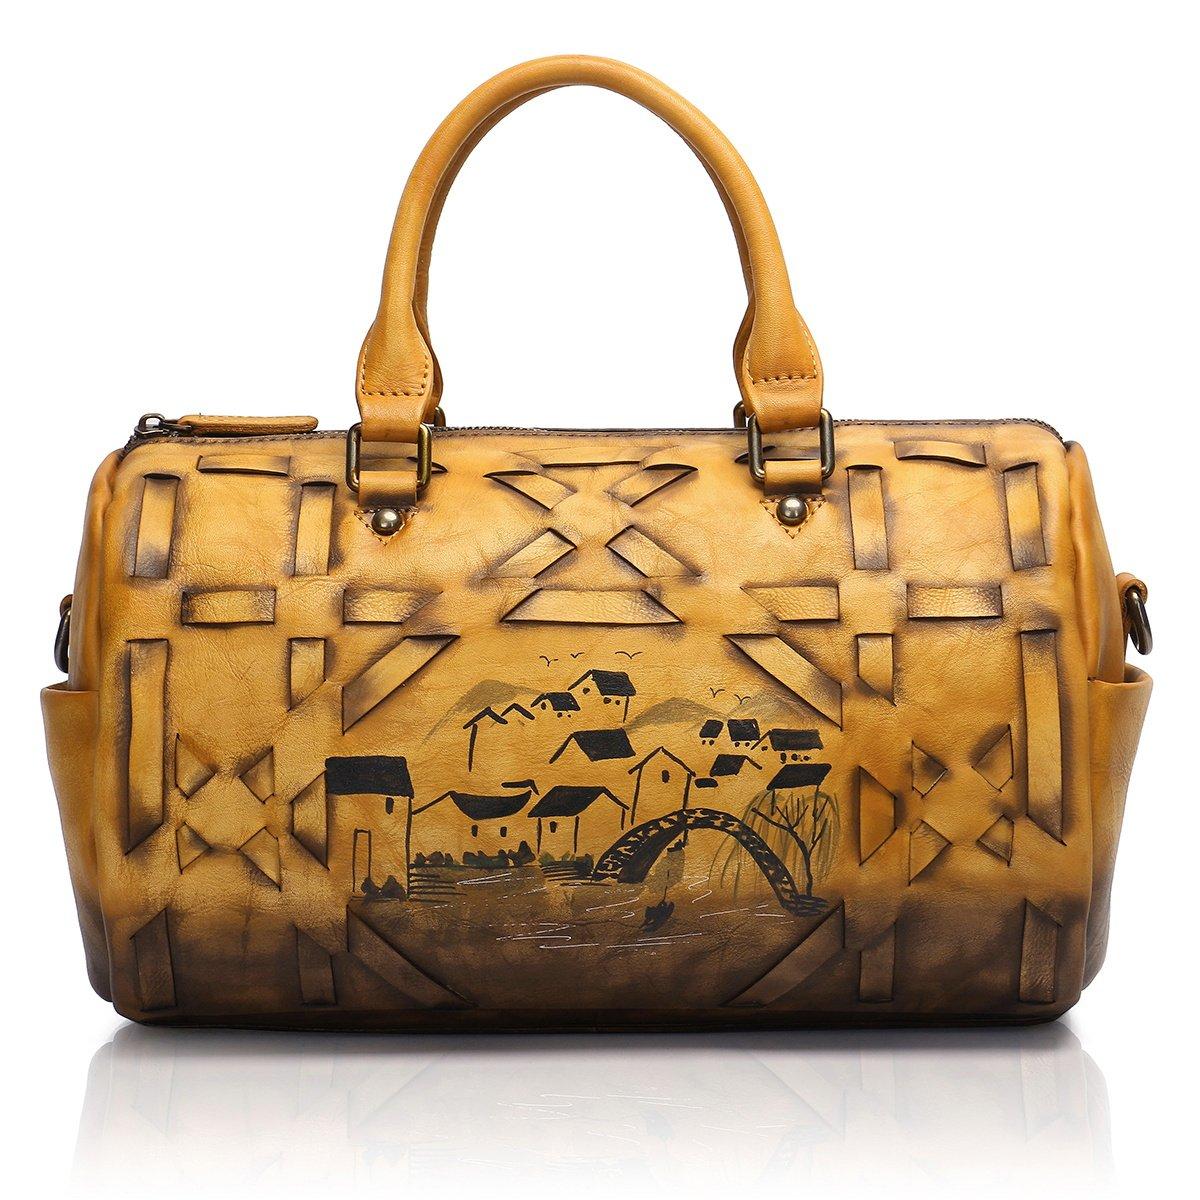 APHISON Designer Soft Leather Totes Handbags for Women, Ladies Satchels Shoulder Bags 8145 (BROWN)